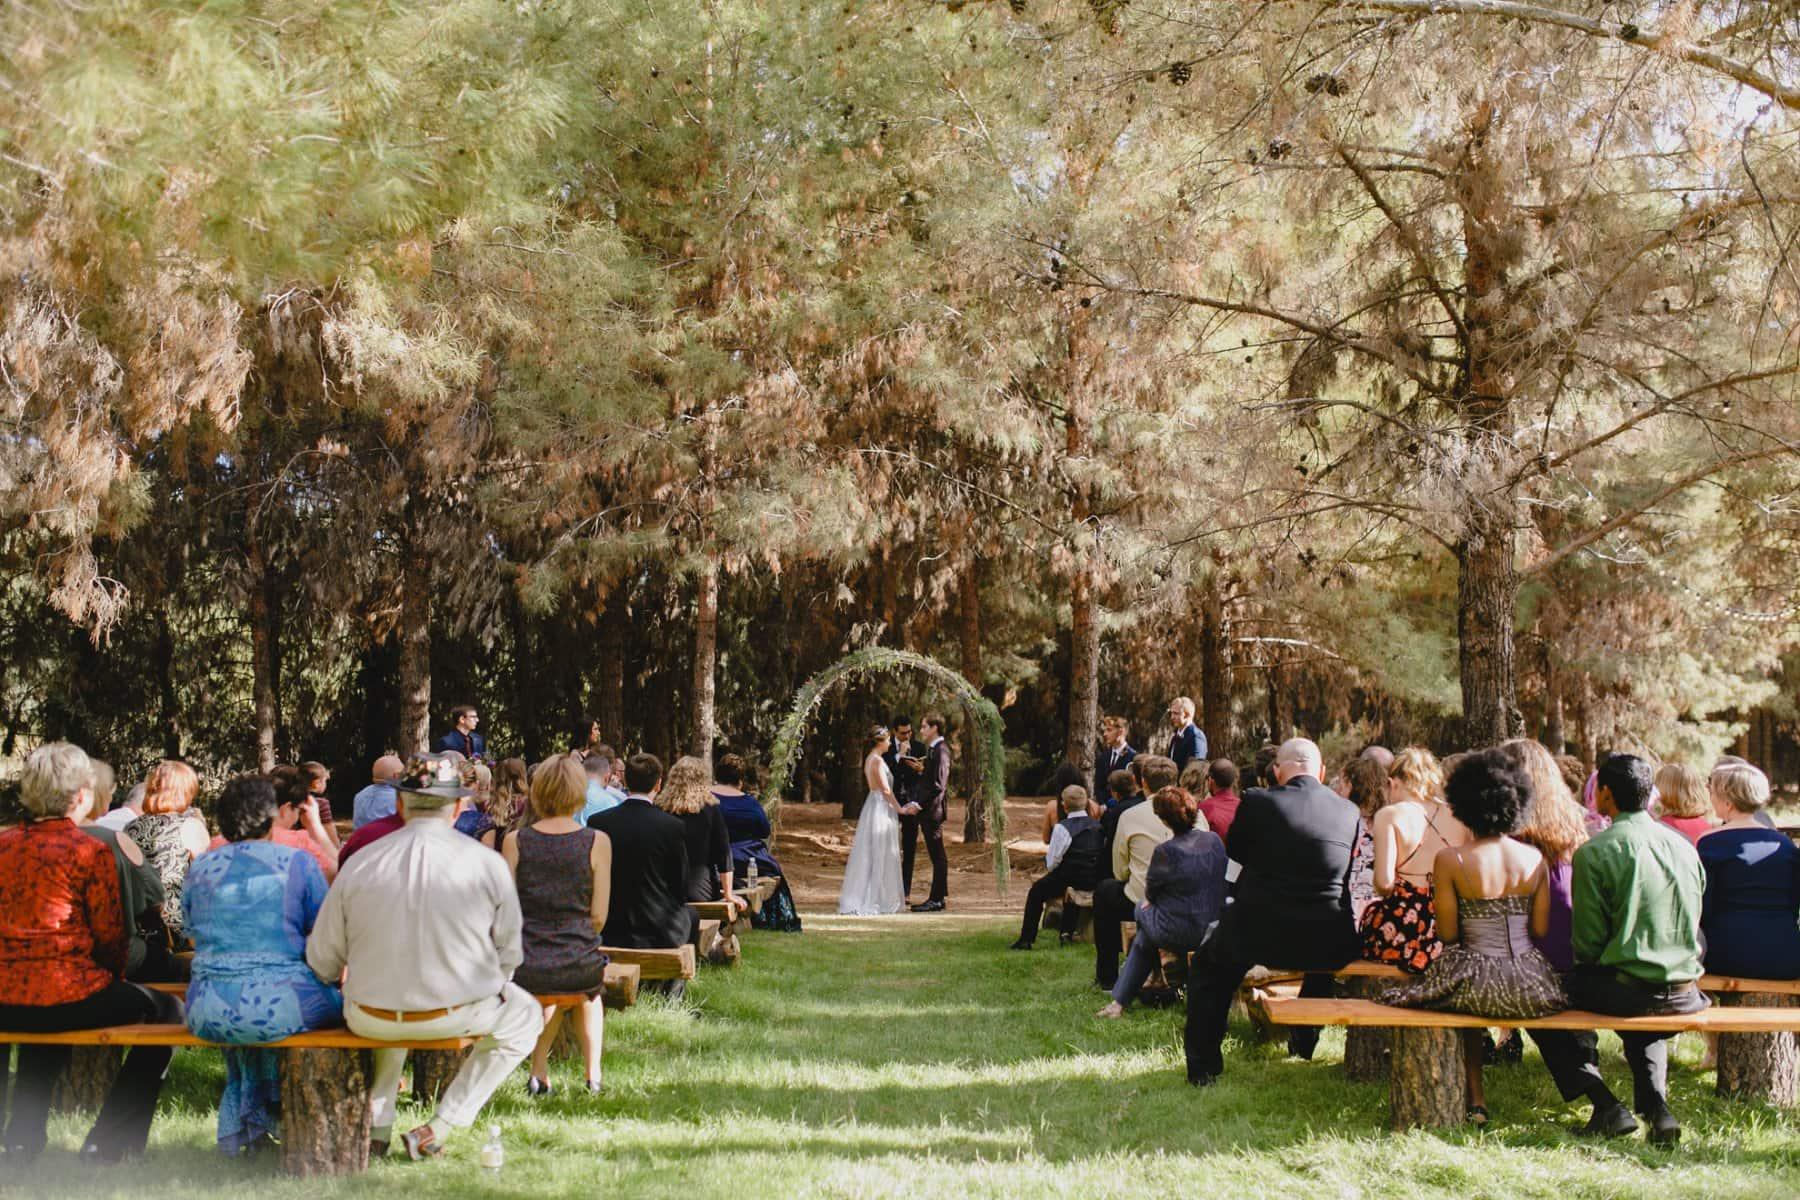 rustic outdoor wedding ceremony at the Meadow Schnepf Farms AZ